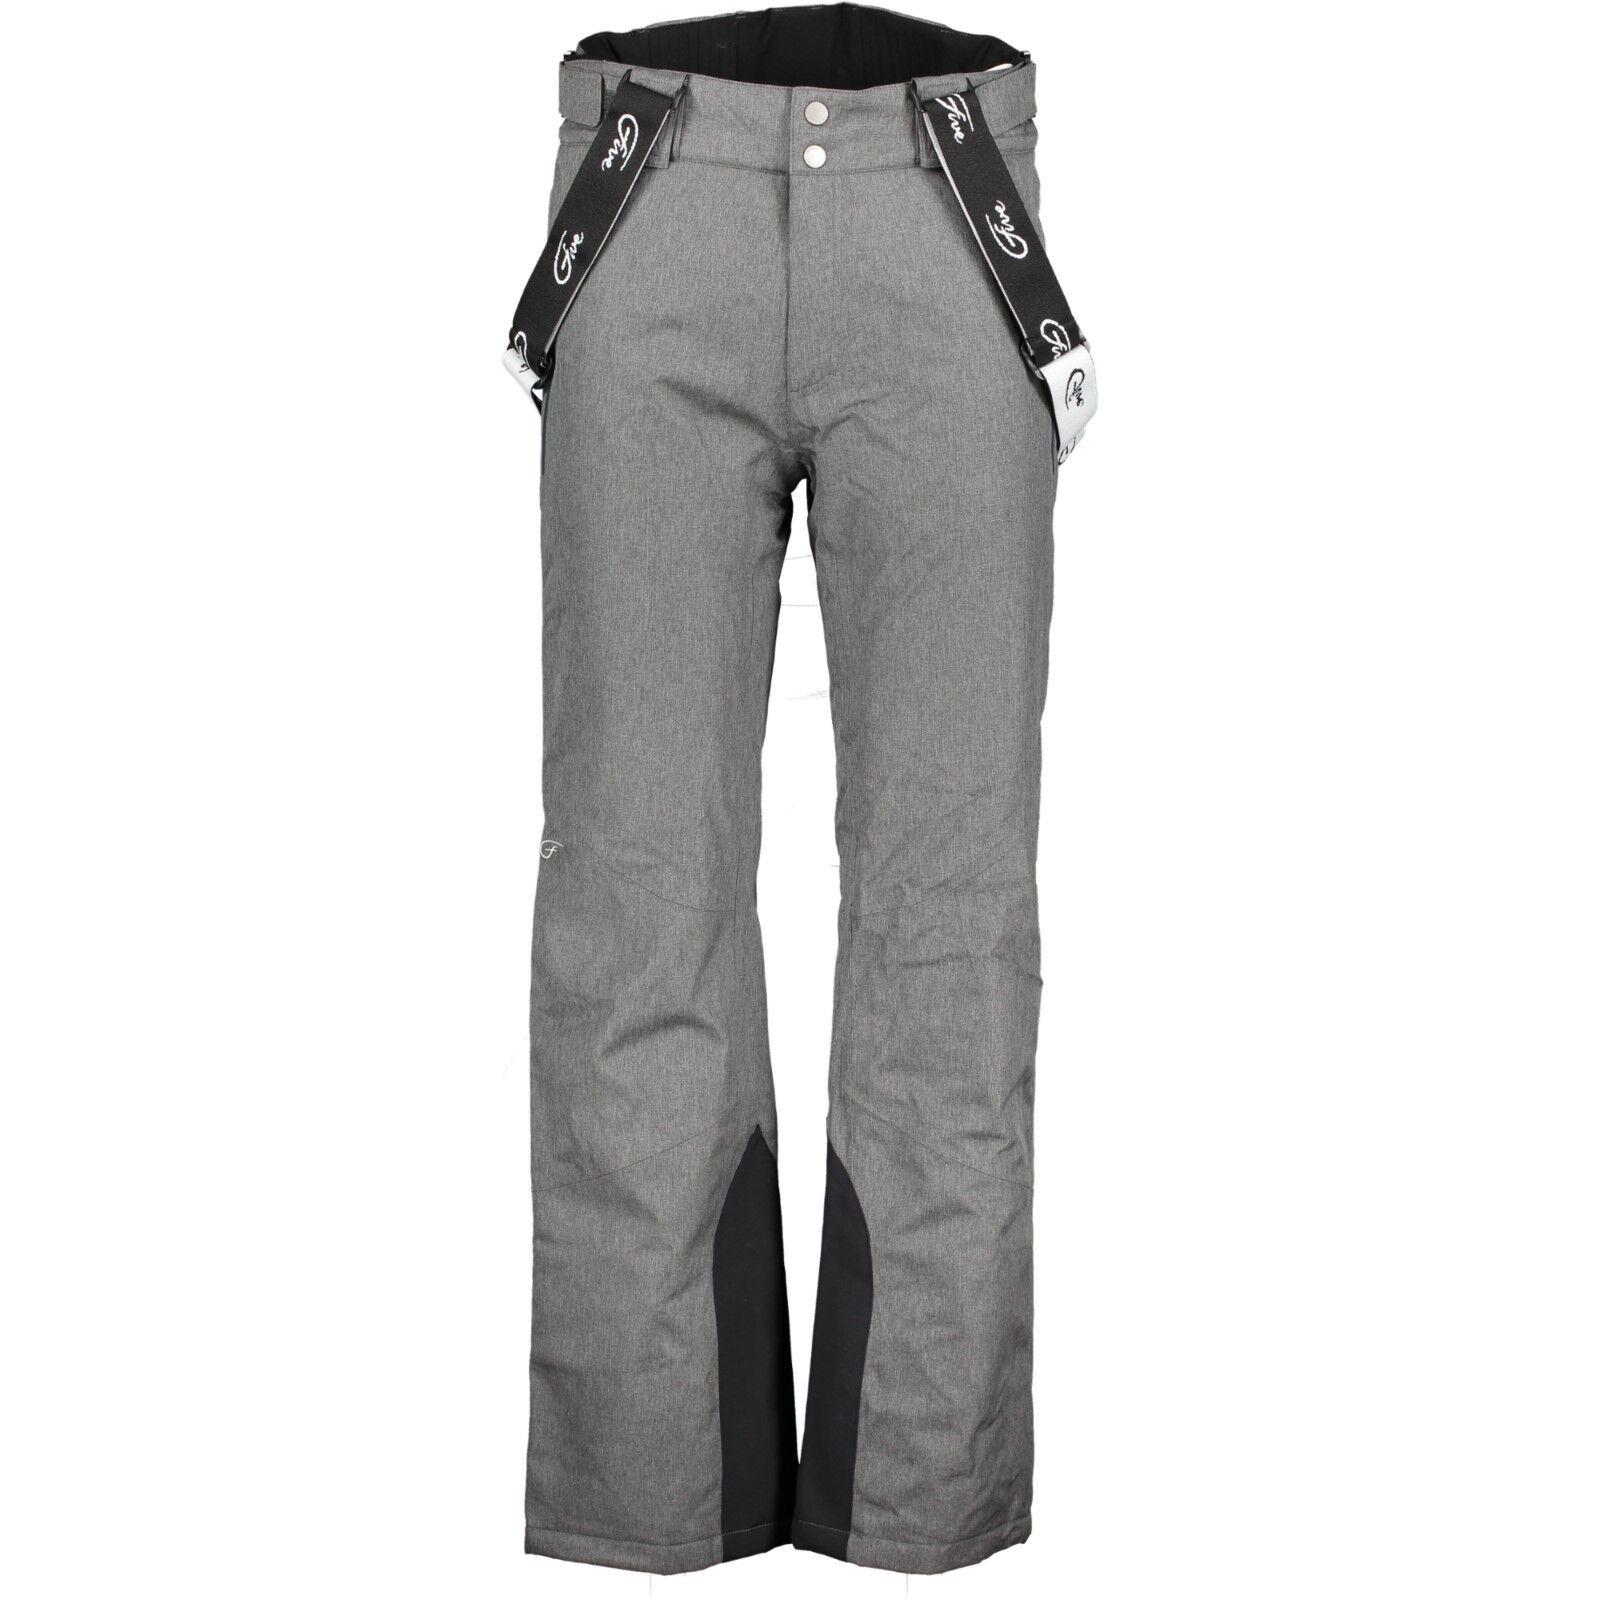 5 temporadas pantalones blancoos, pantalones de invierno, pantalones de hombre, pantalones grises.